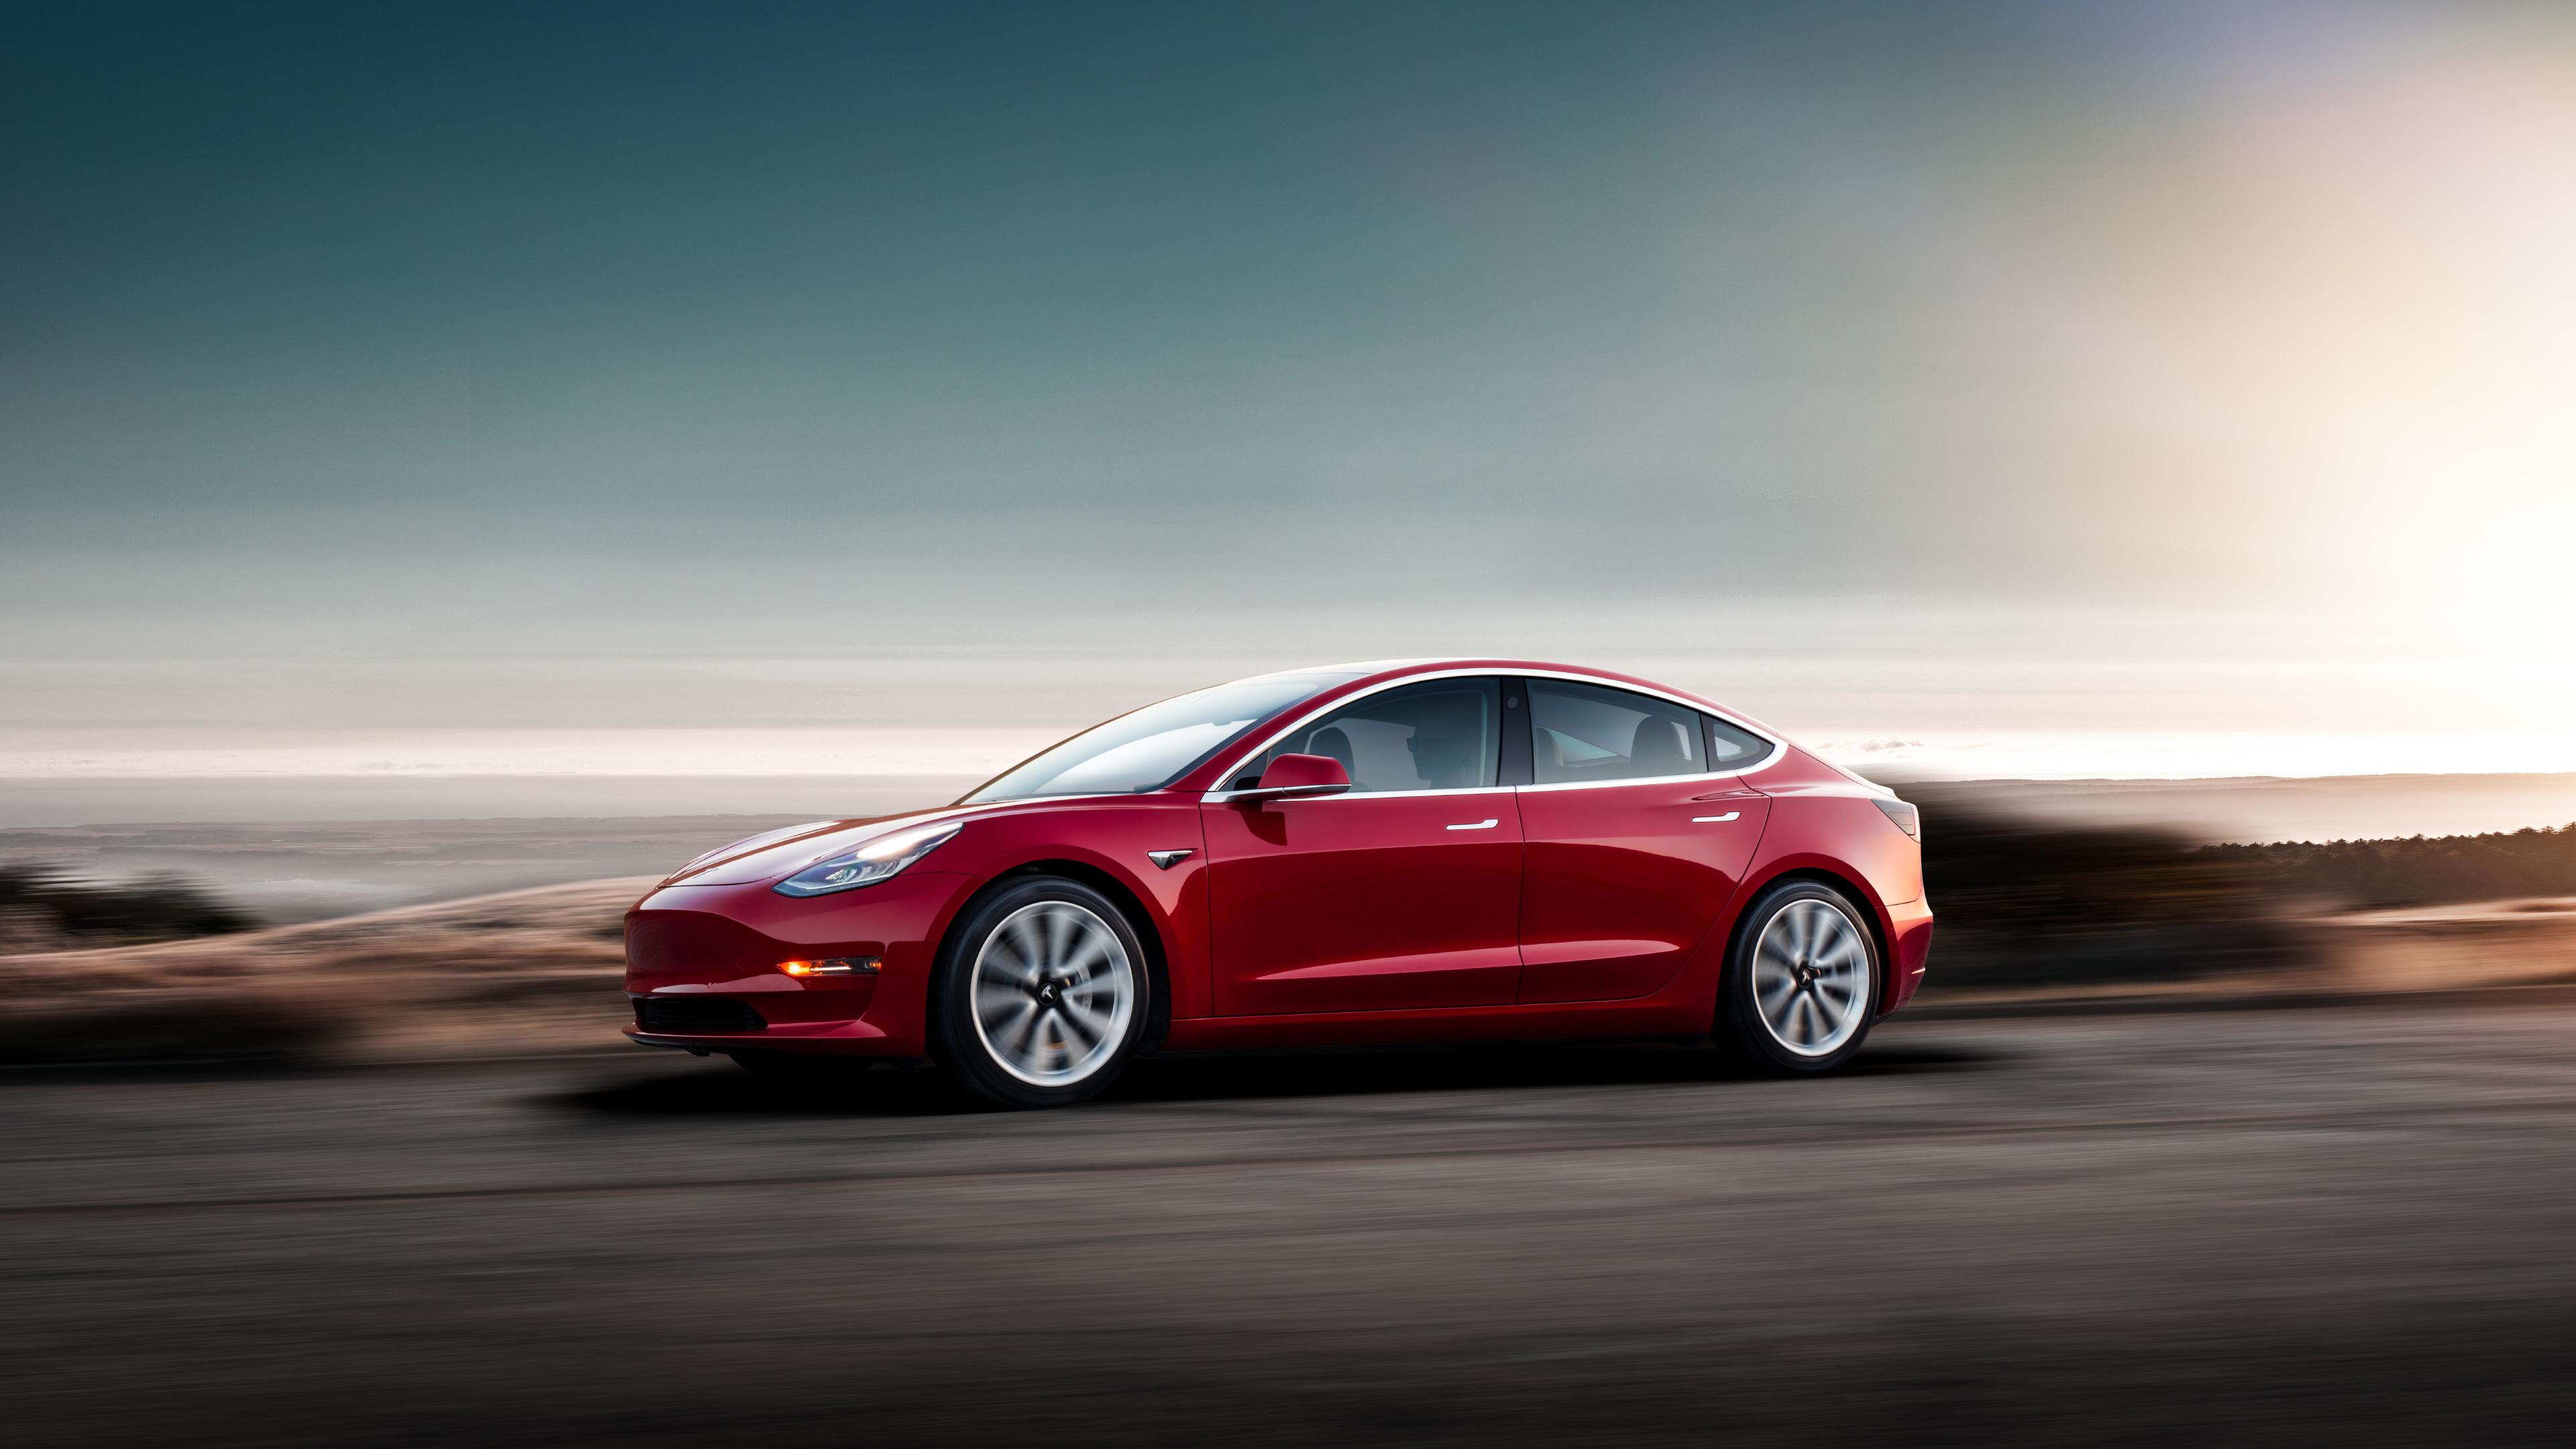 2018 Tesla Model 3, HD Cars, 4k Wallpapers, Images ...